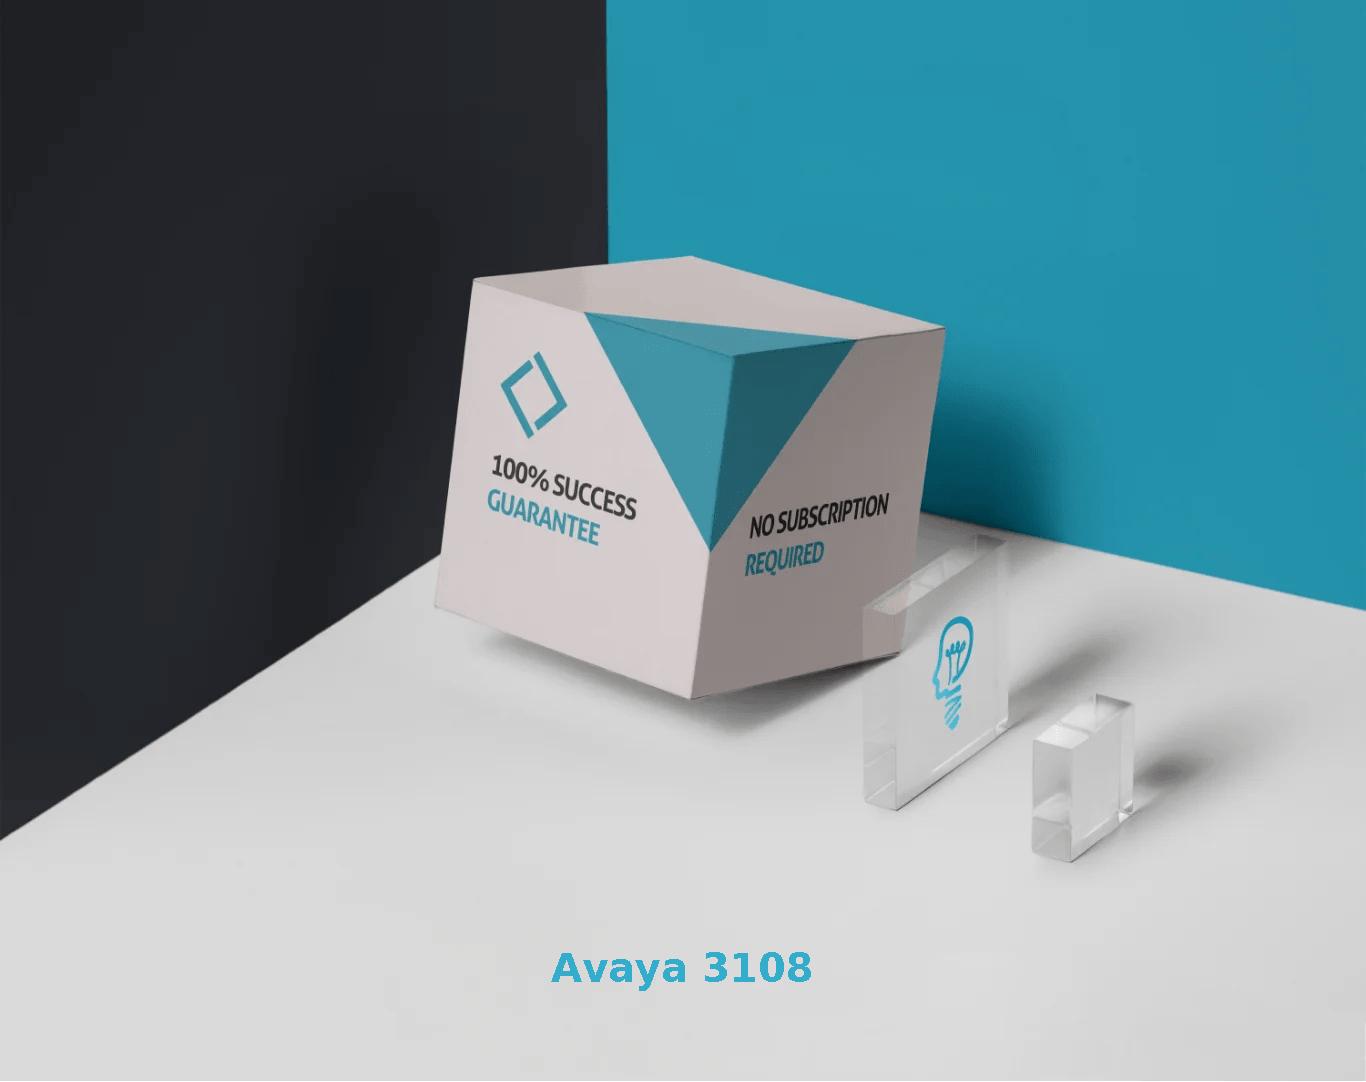 Avaya 3108 Exams